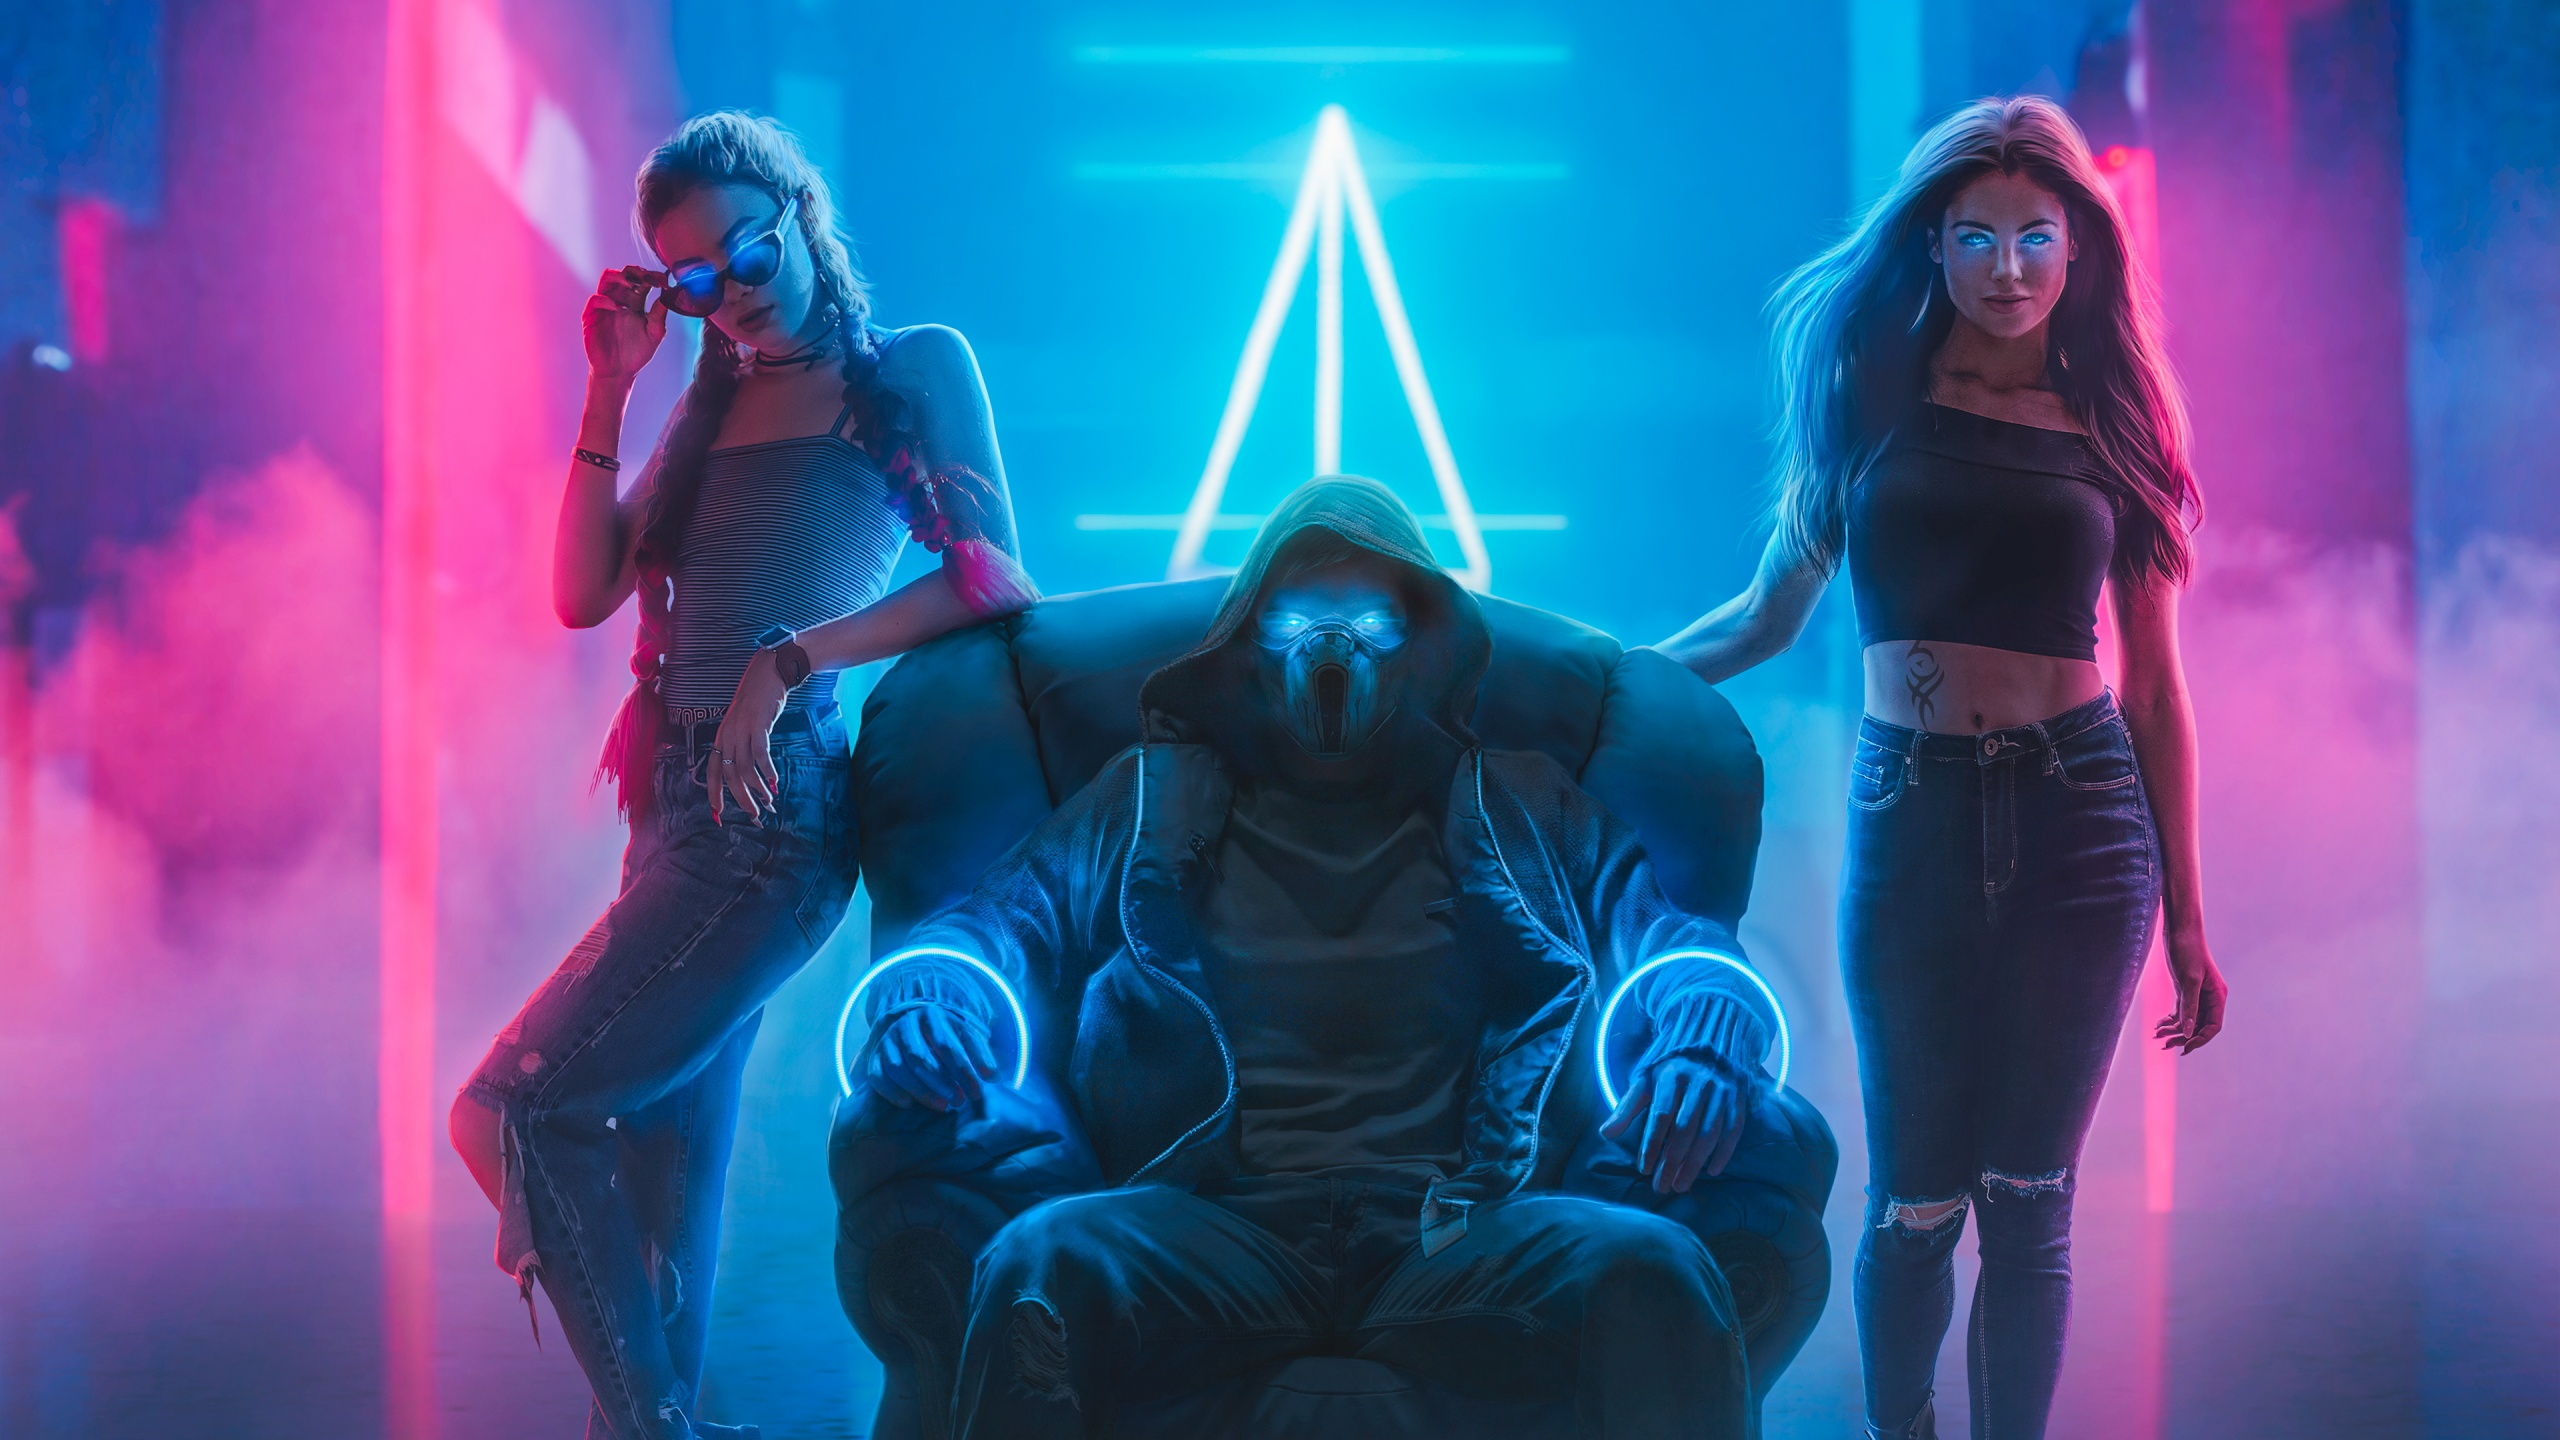 Bad Boy 4k Wallpaper Bad Girls Neon Light Night Club Mask Cyberpunk Digital Art Graphics Cgi 985